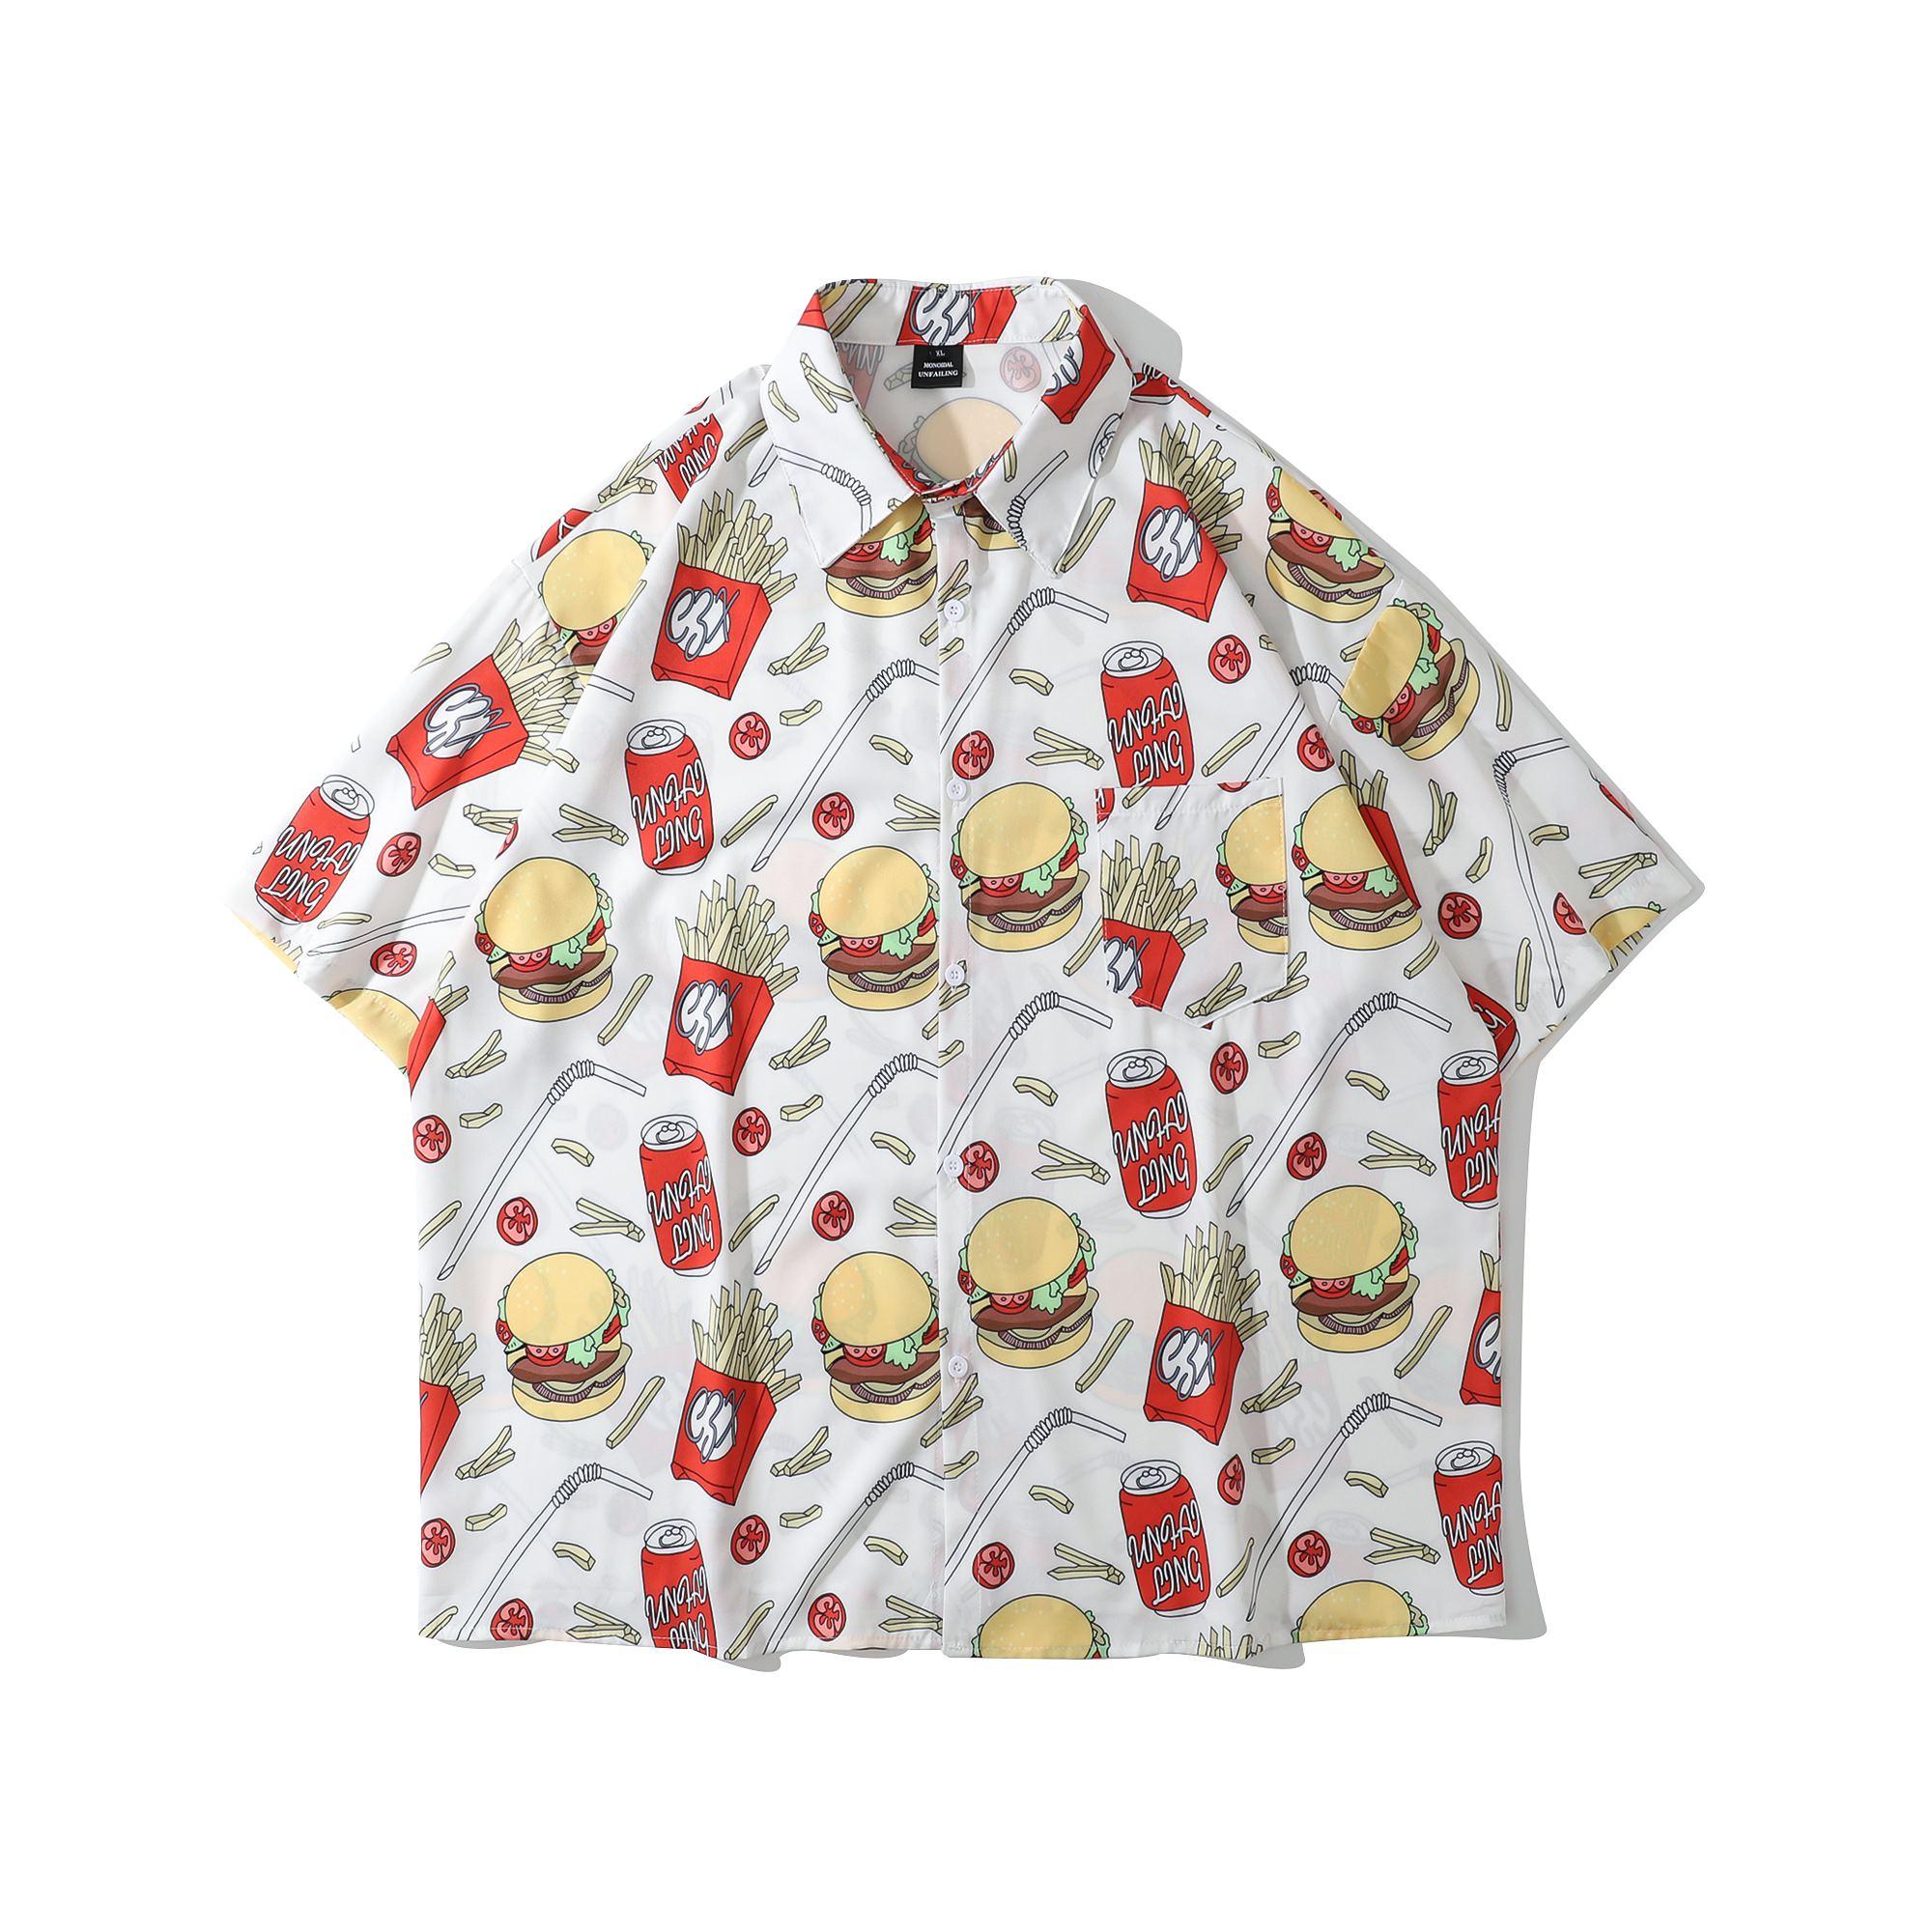 BURGER BURGER 半袖シャツの画像1